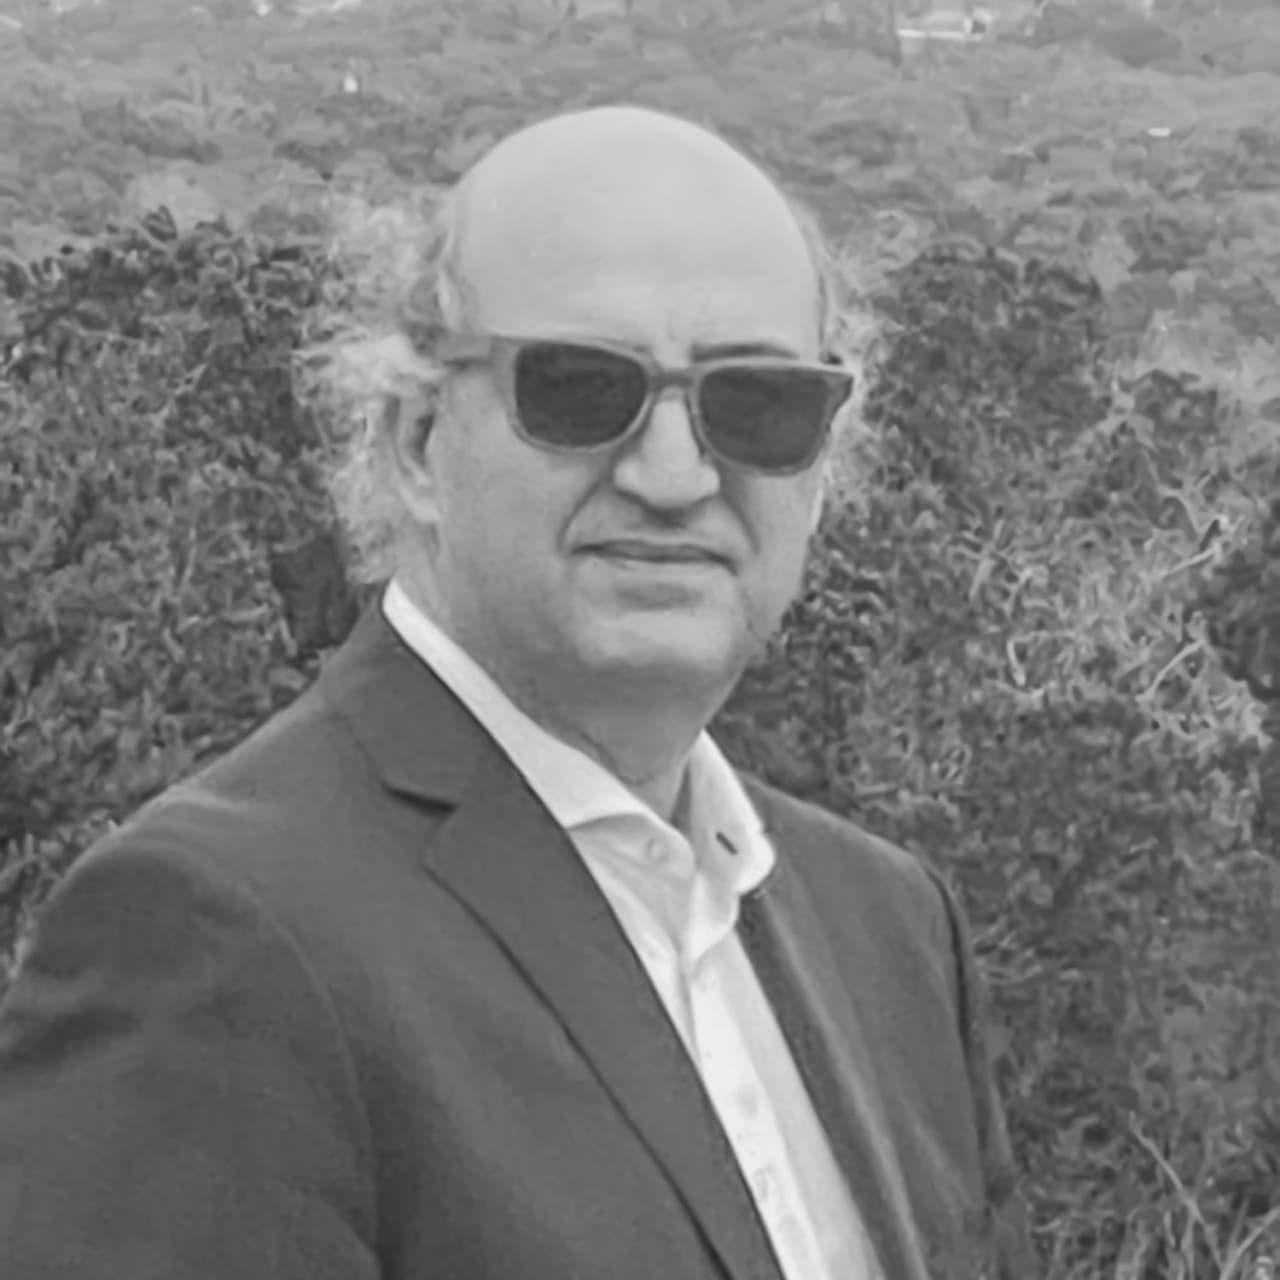 Mustapha Chbinou